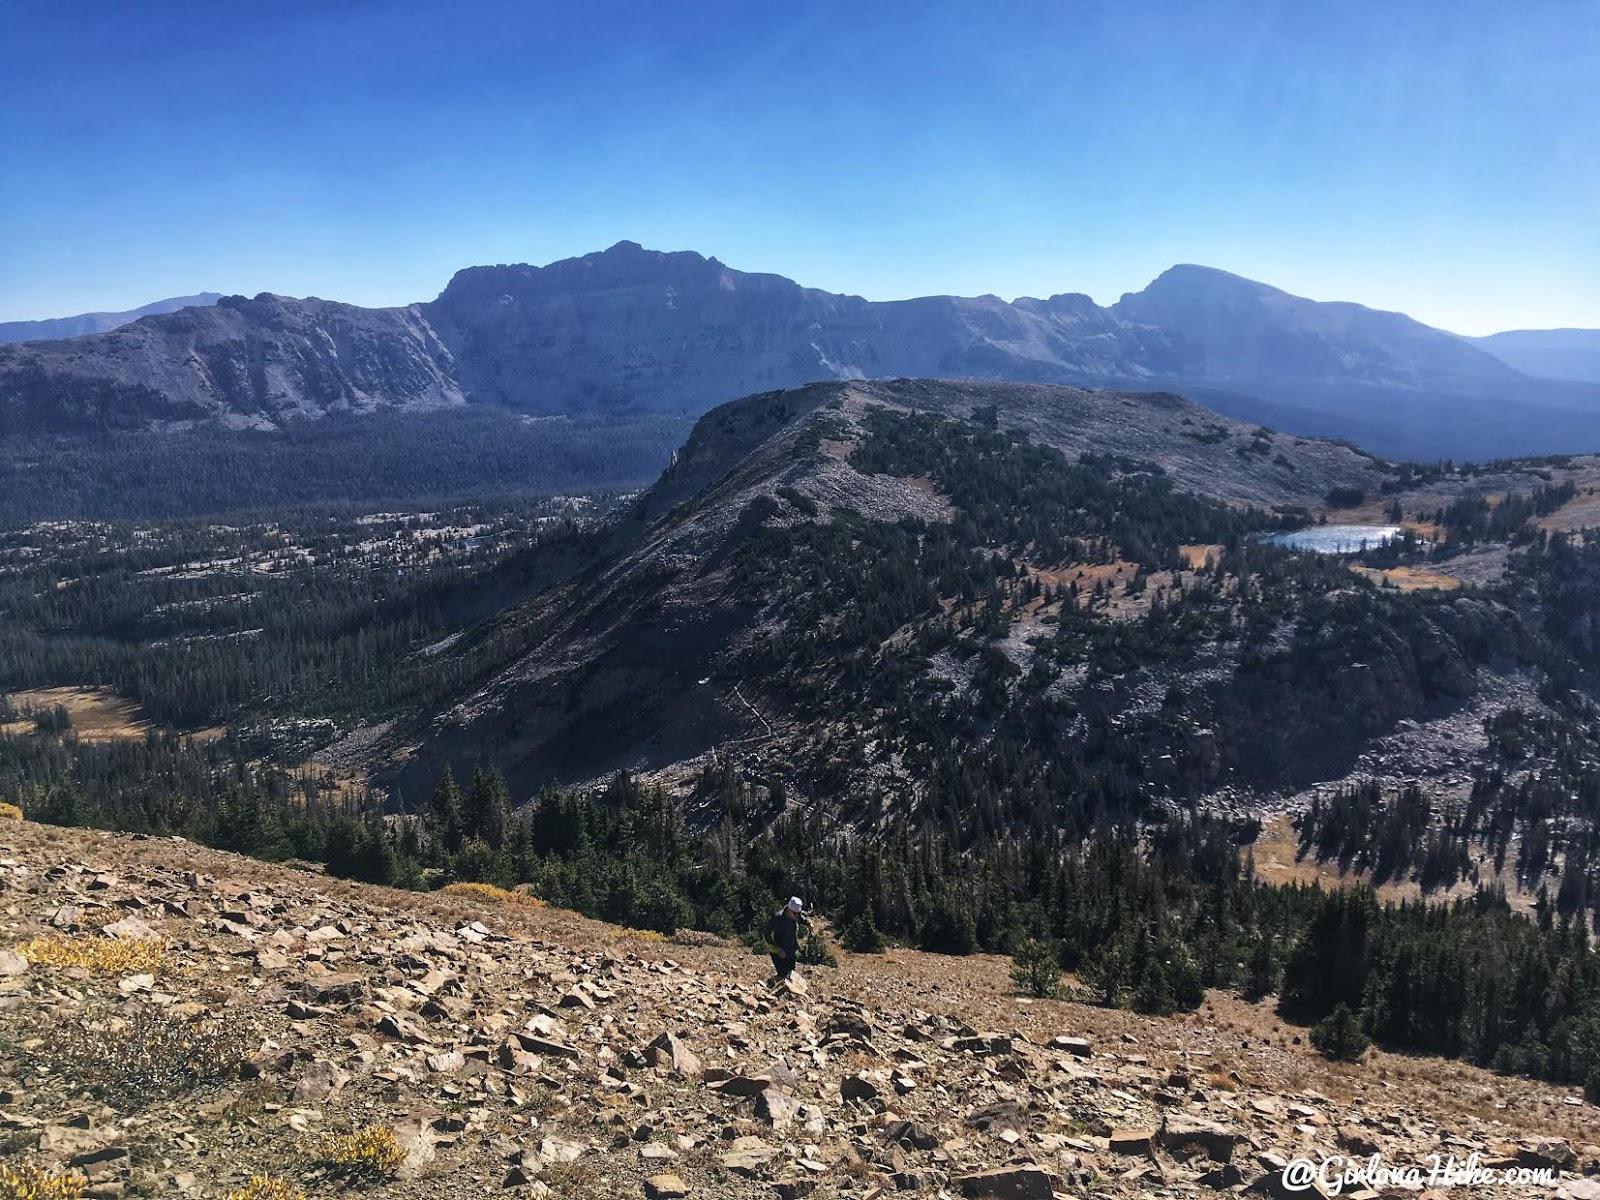 Backpacking to Teal Lake & Mt. Marsell, Uintas